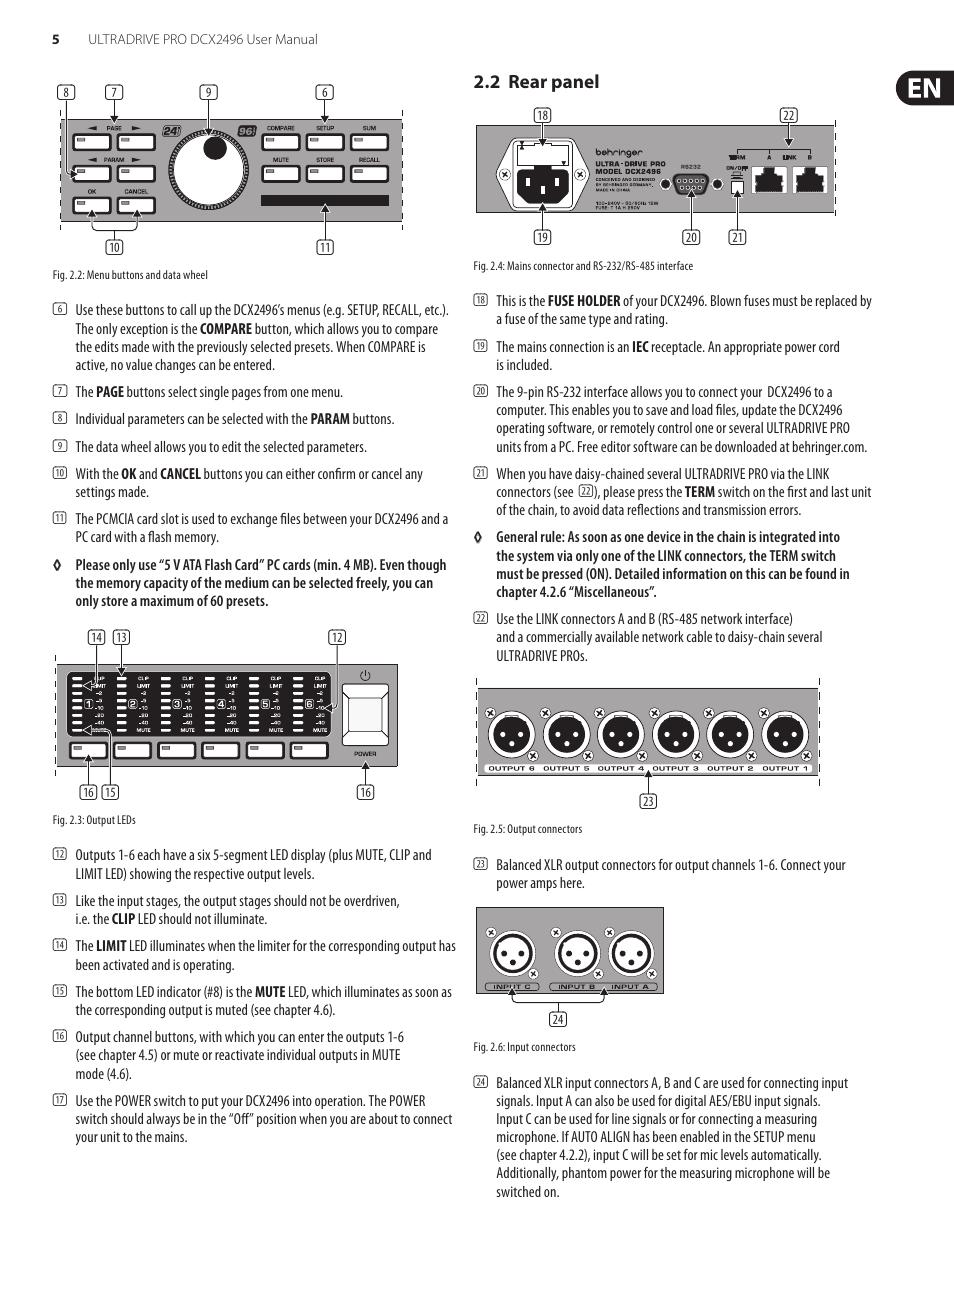 behringer ultradrive pro dcx2496 user manual page 5 35 rh manualsdir com Behringer Digital Crossover Behringer Ultradrive Pro DCX2496 Manual